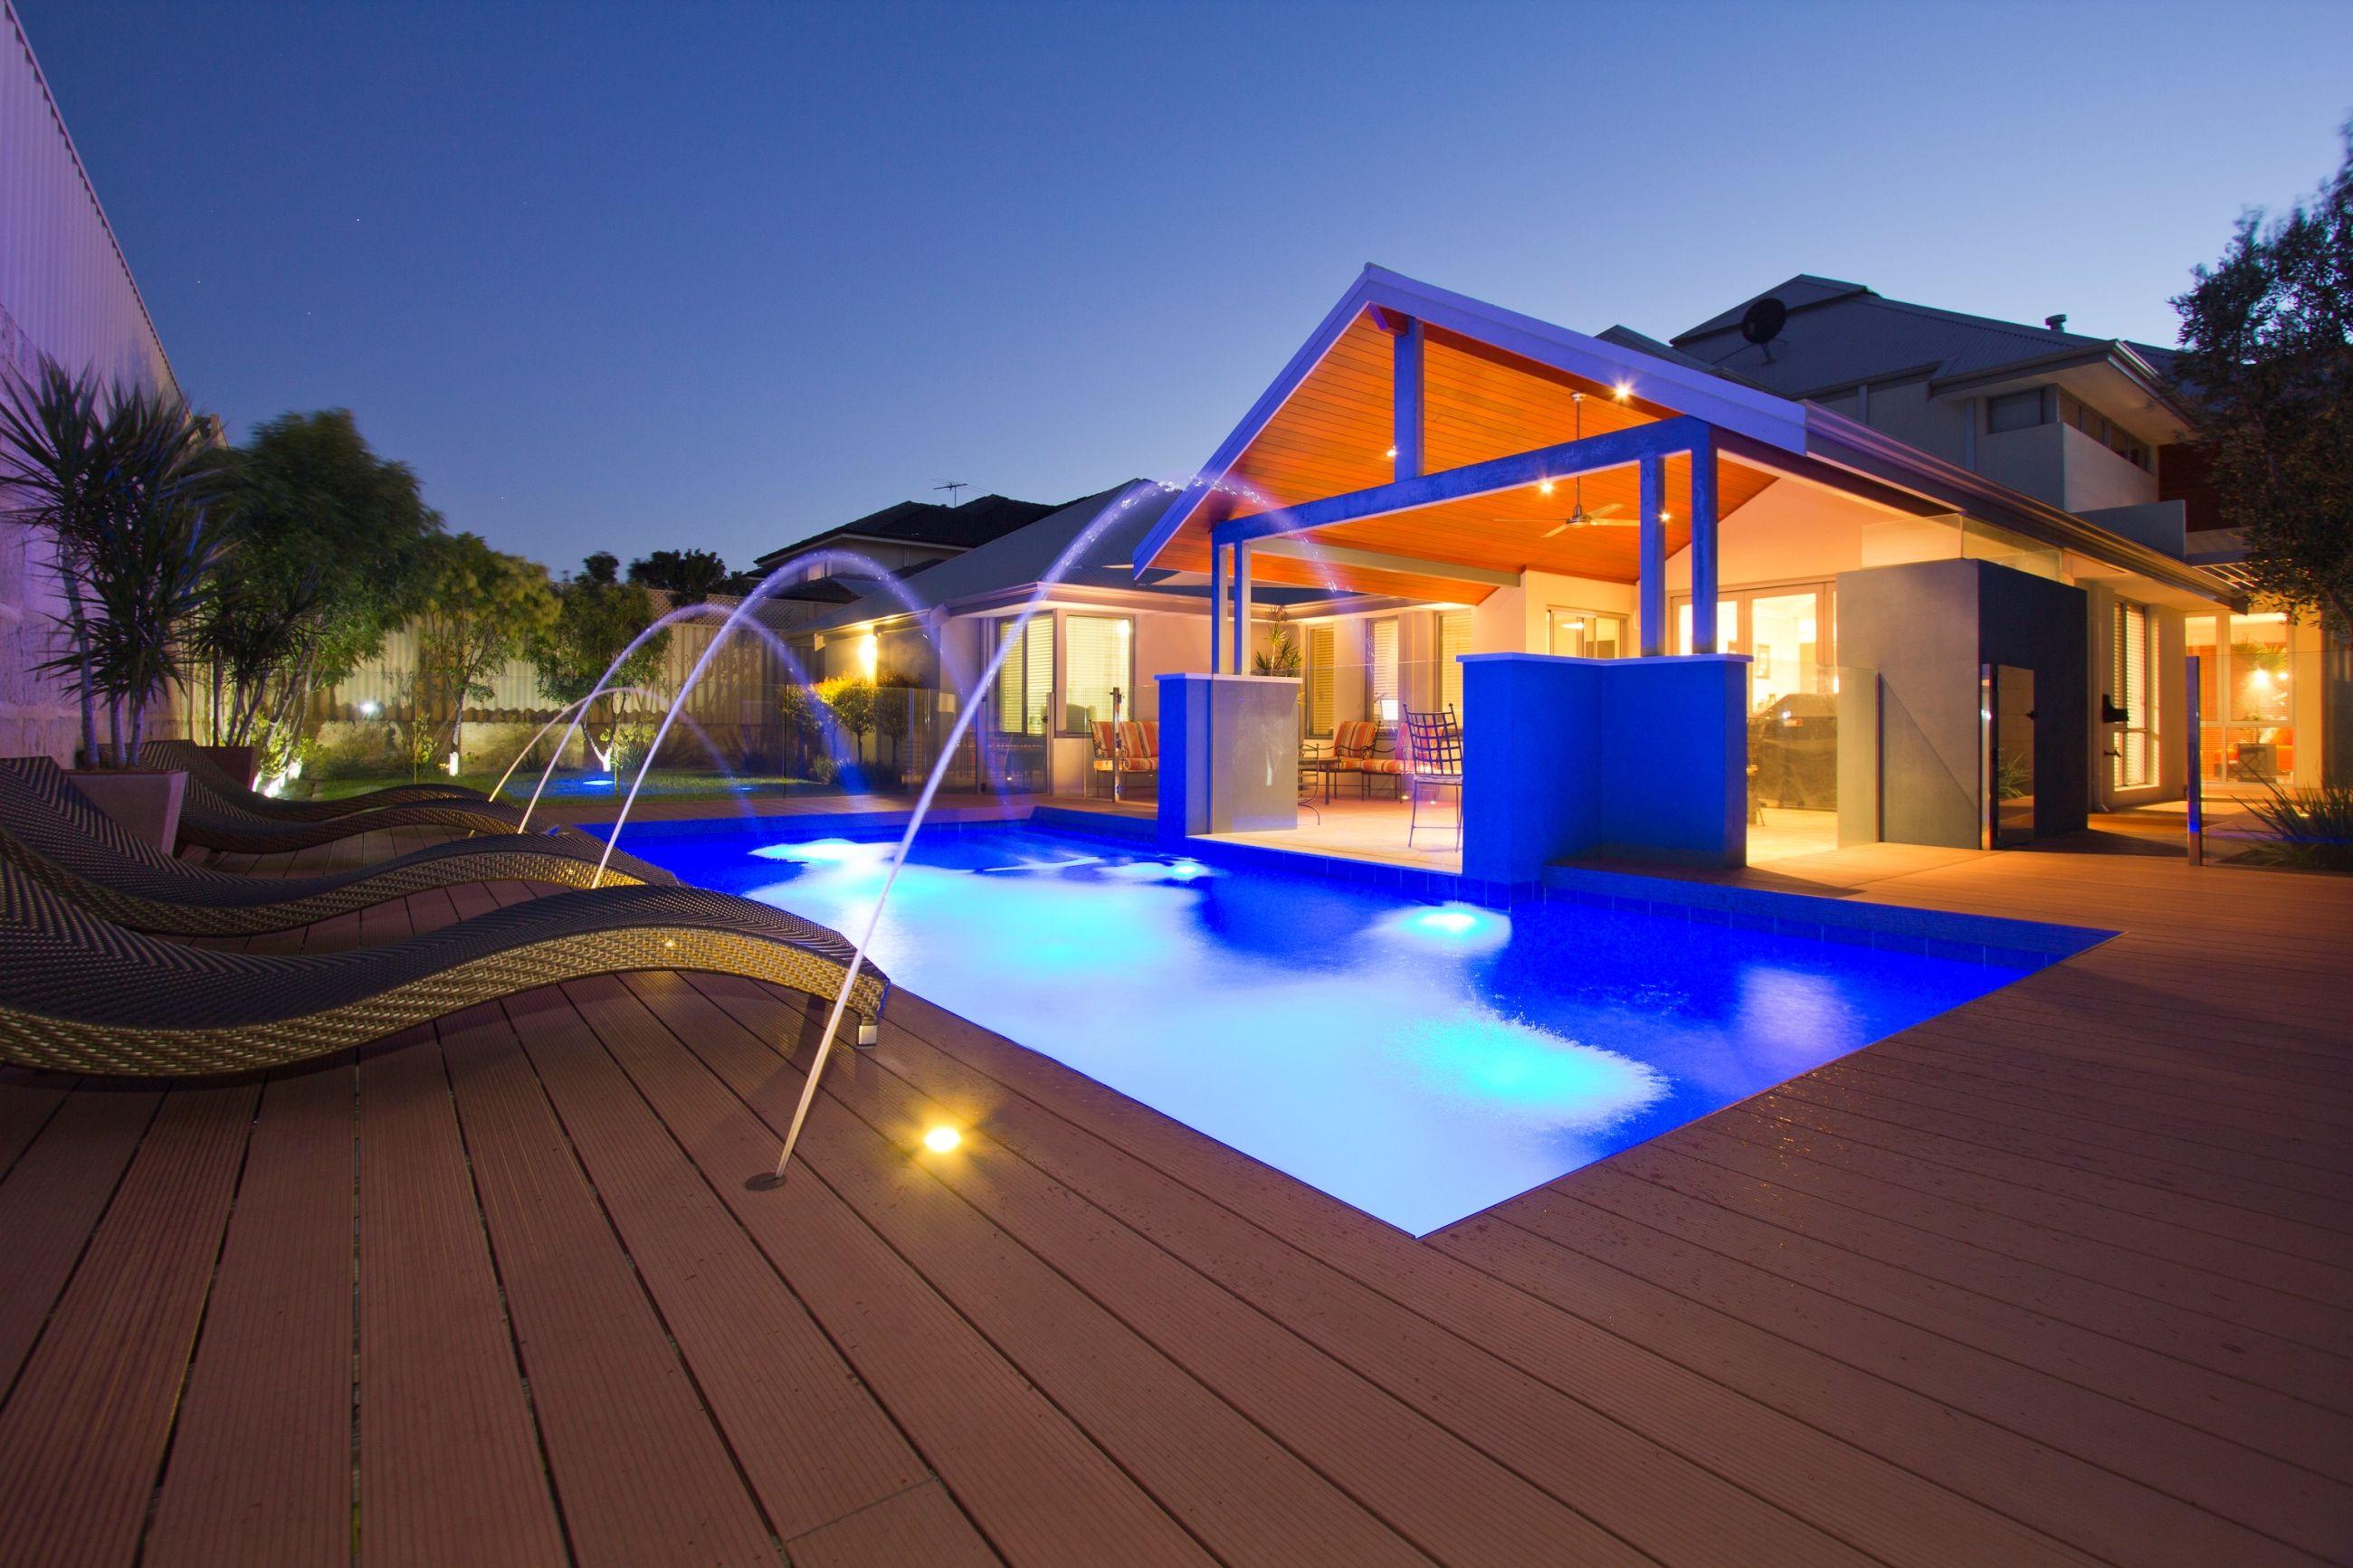 America style swimming pool use